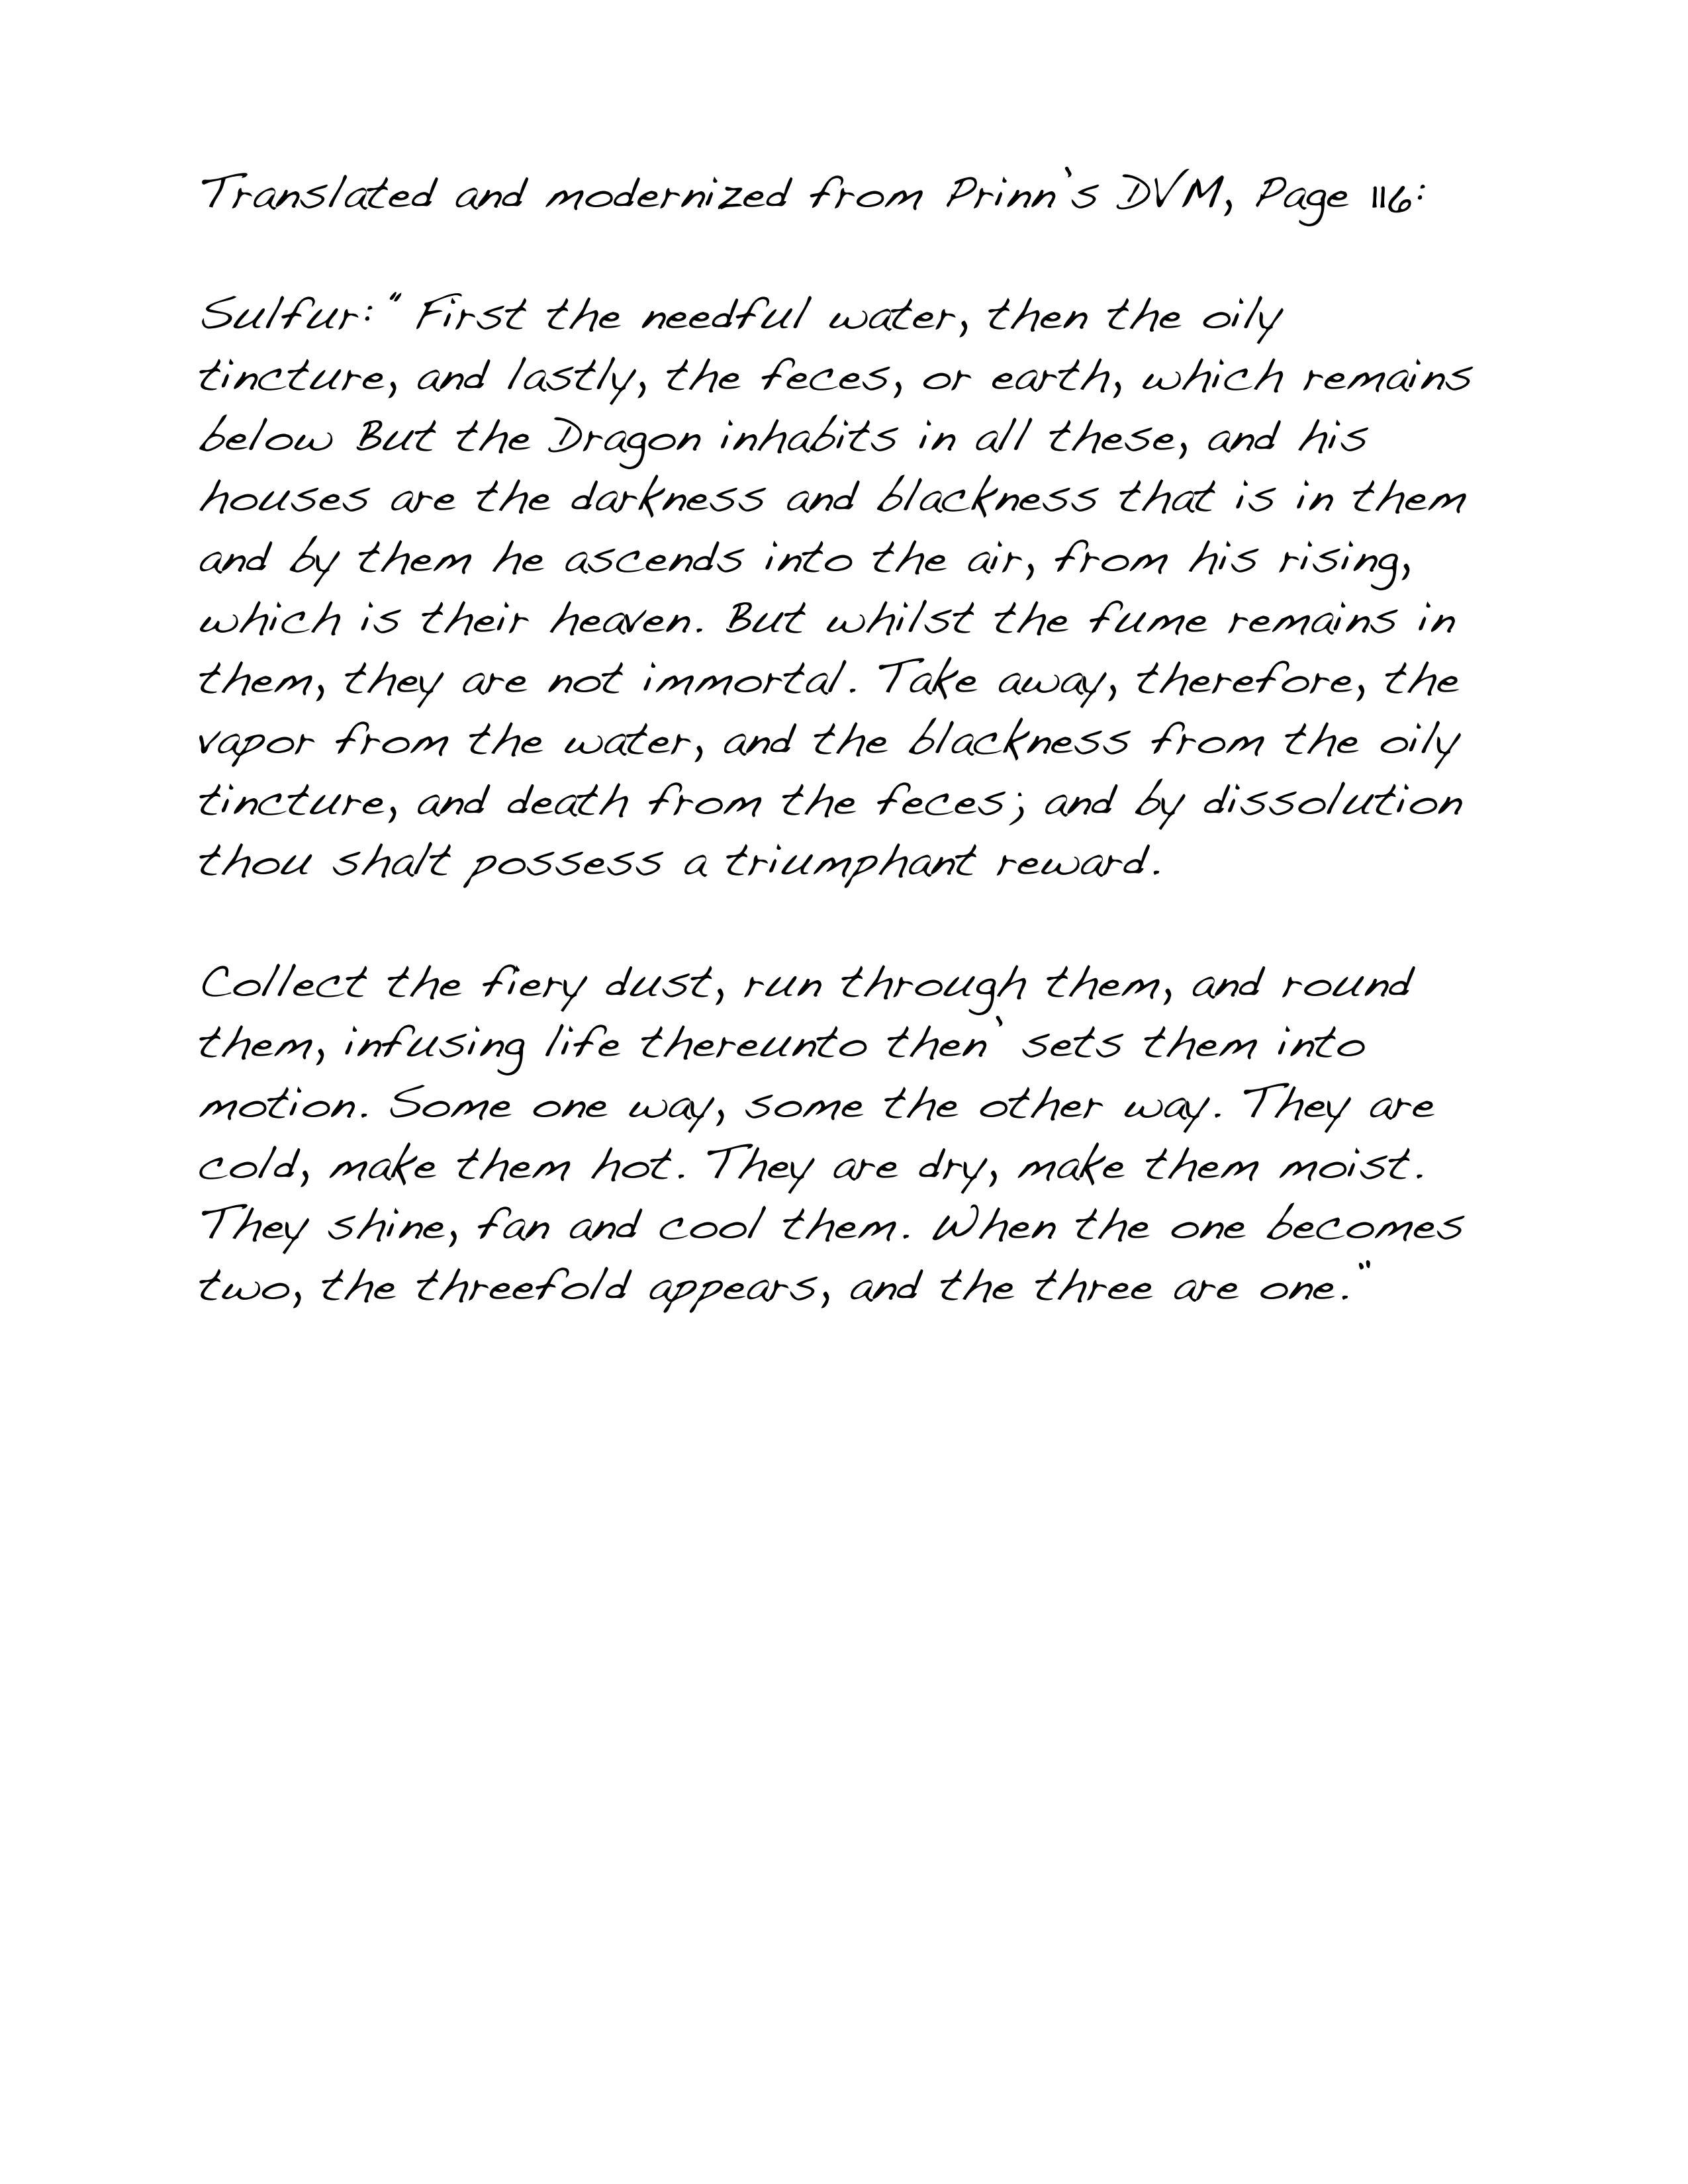 De vermis mysteriis page 5